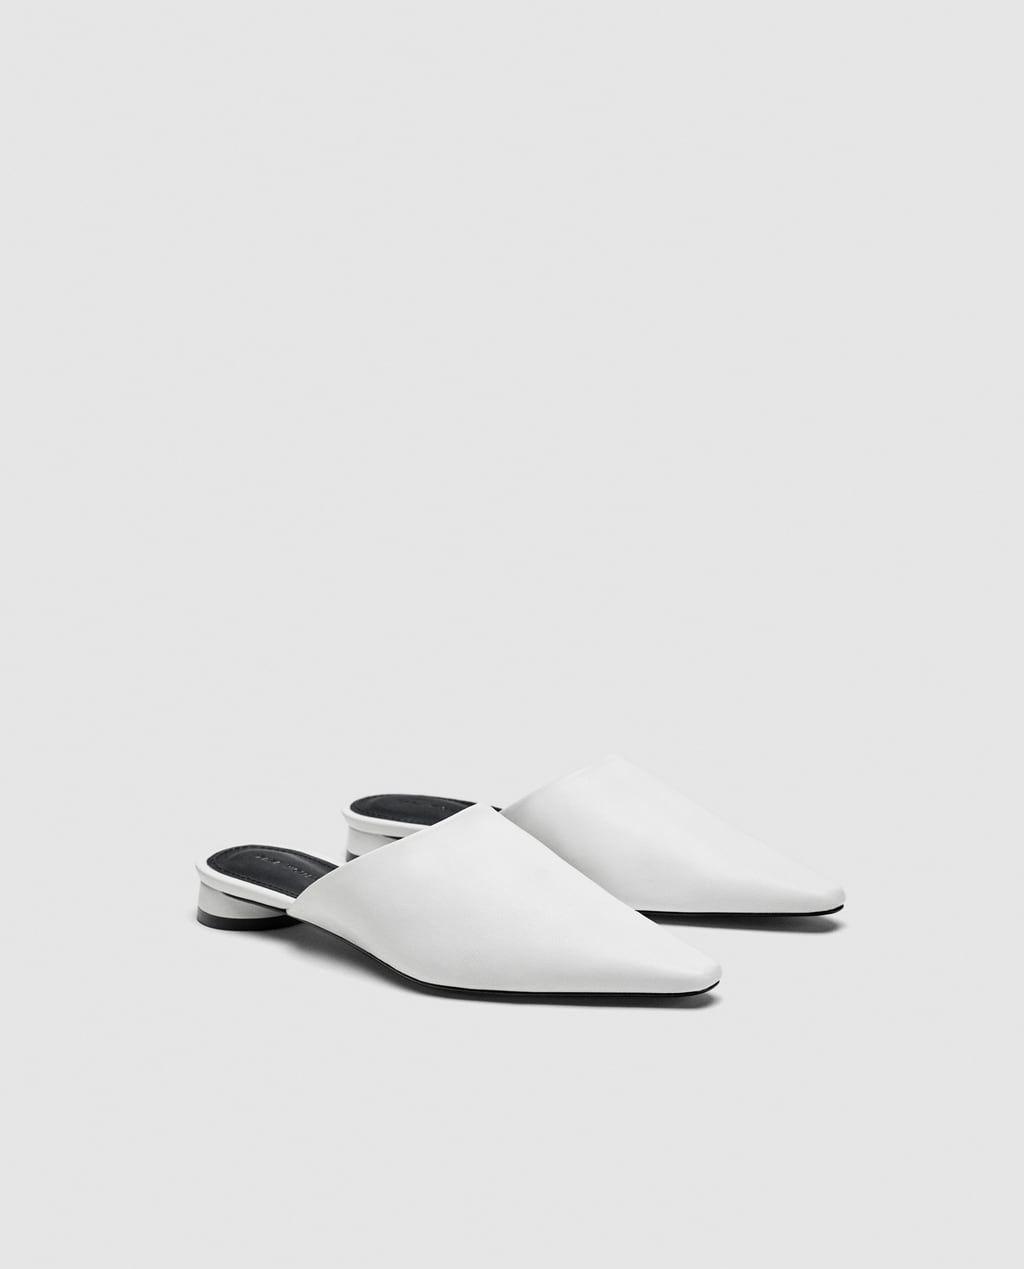 Leather Mules in White @Zara